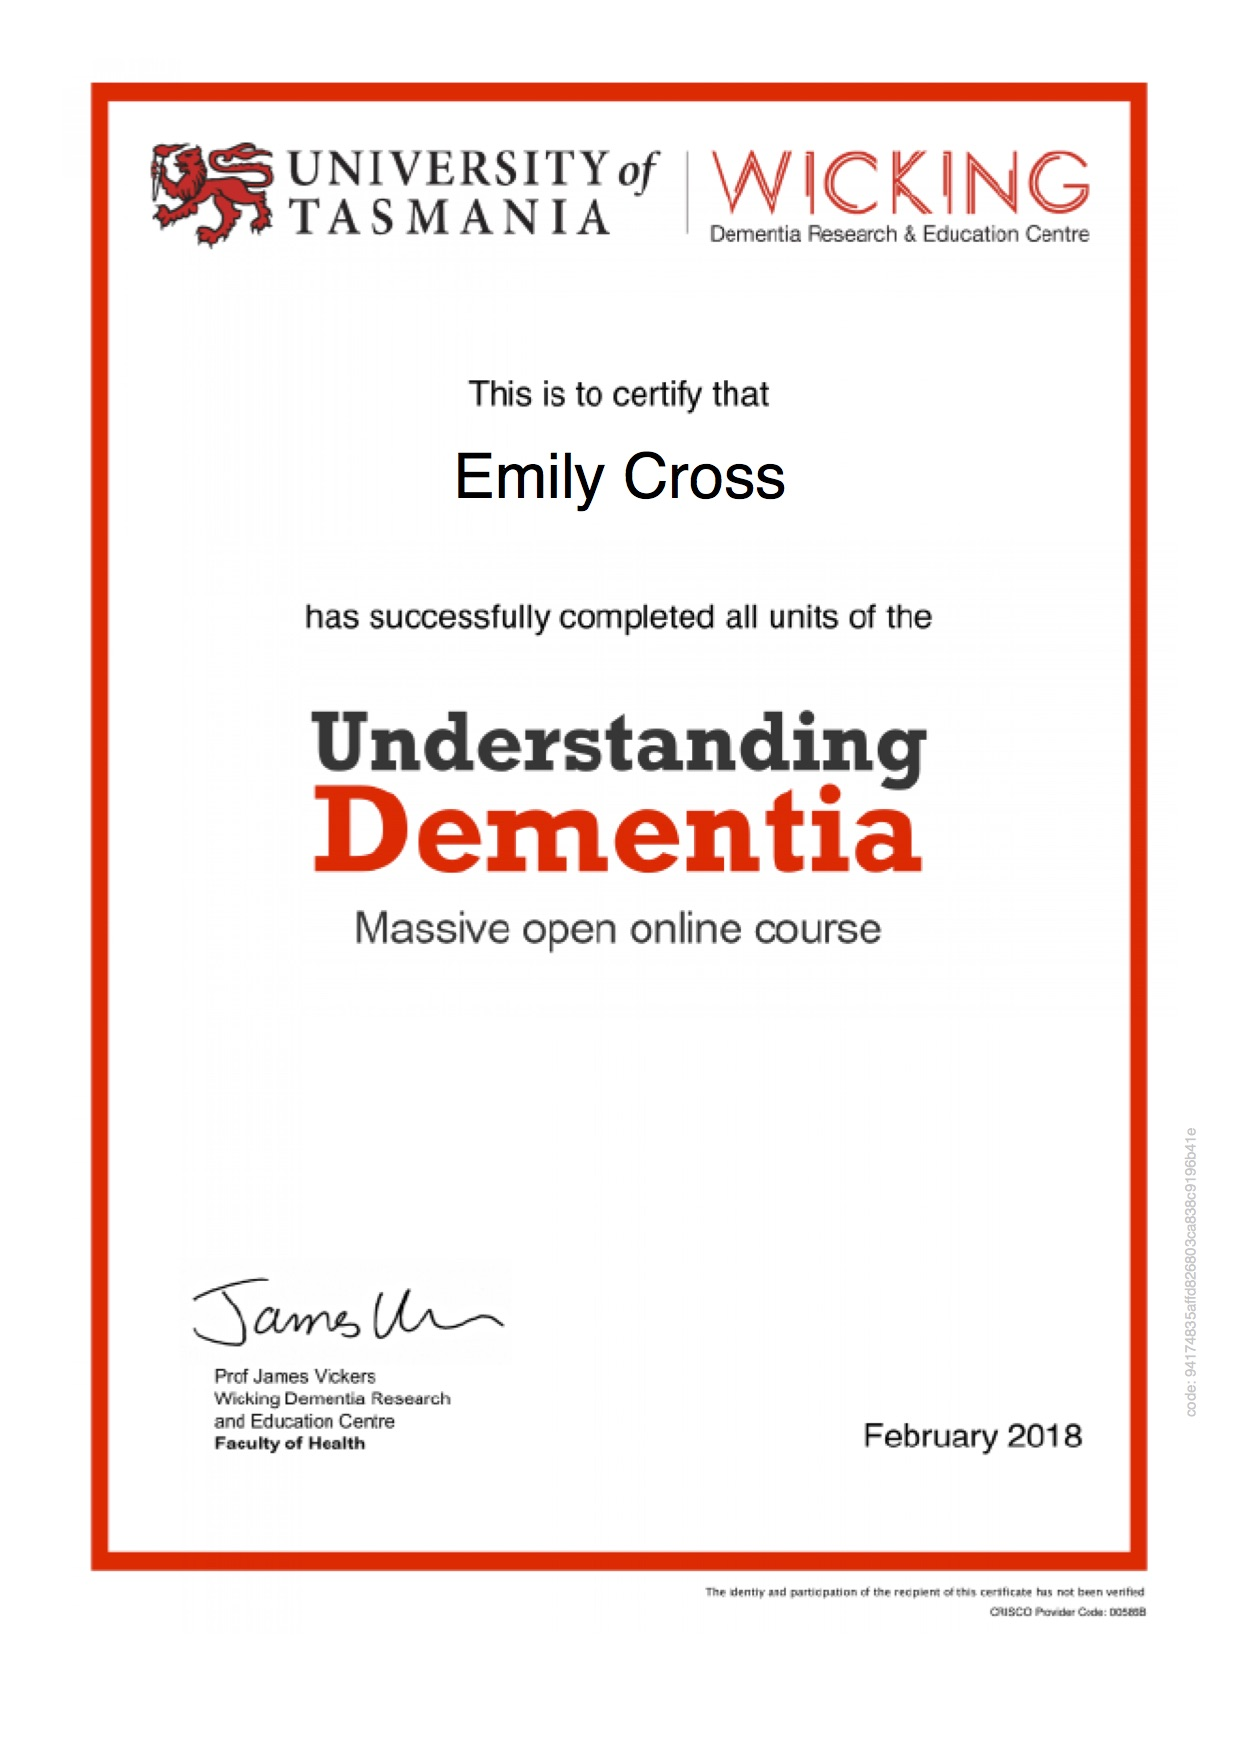 MOOC dementia certificate.jpg